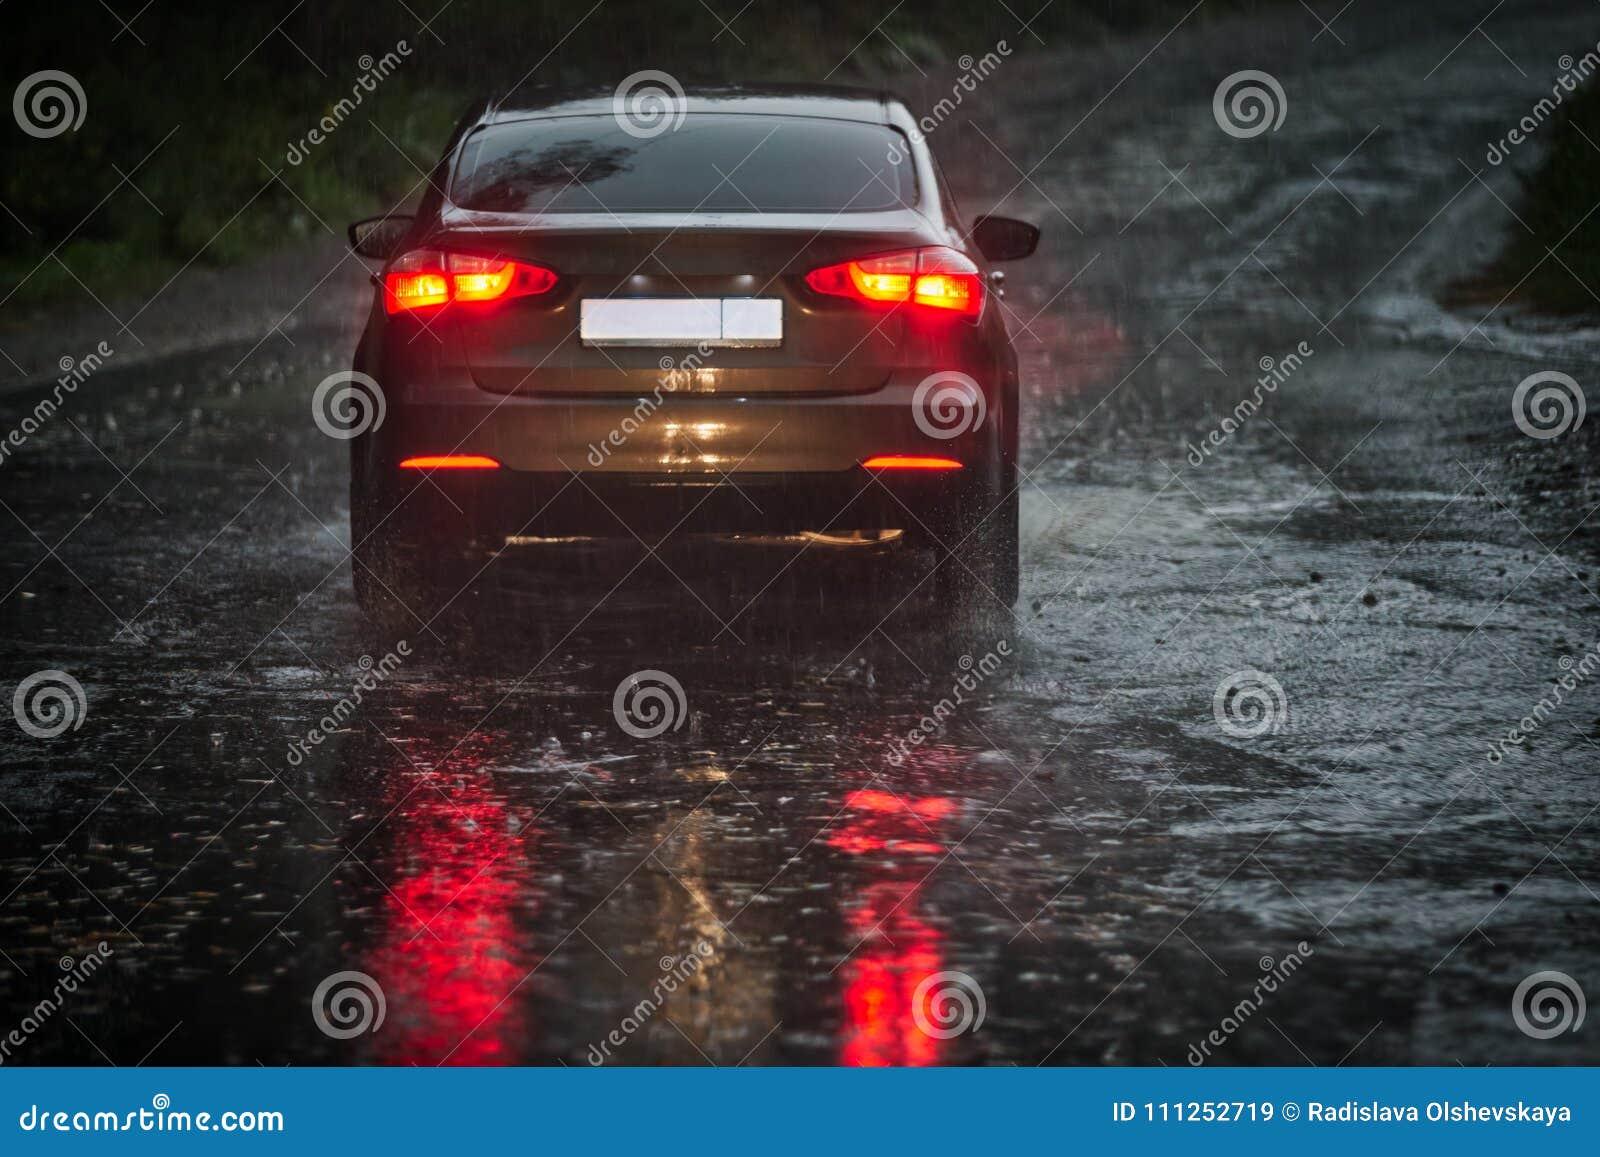 Sikt från engjord genomvåt vindruta på en bil framme